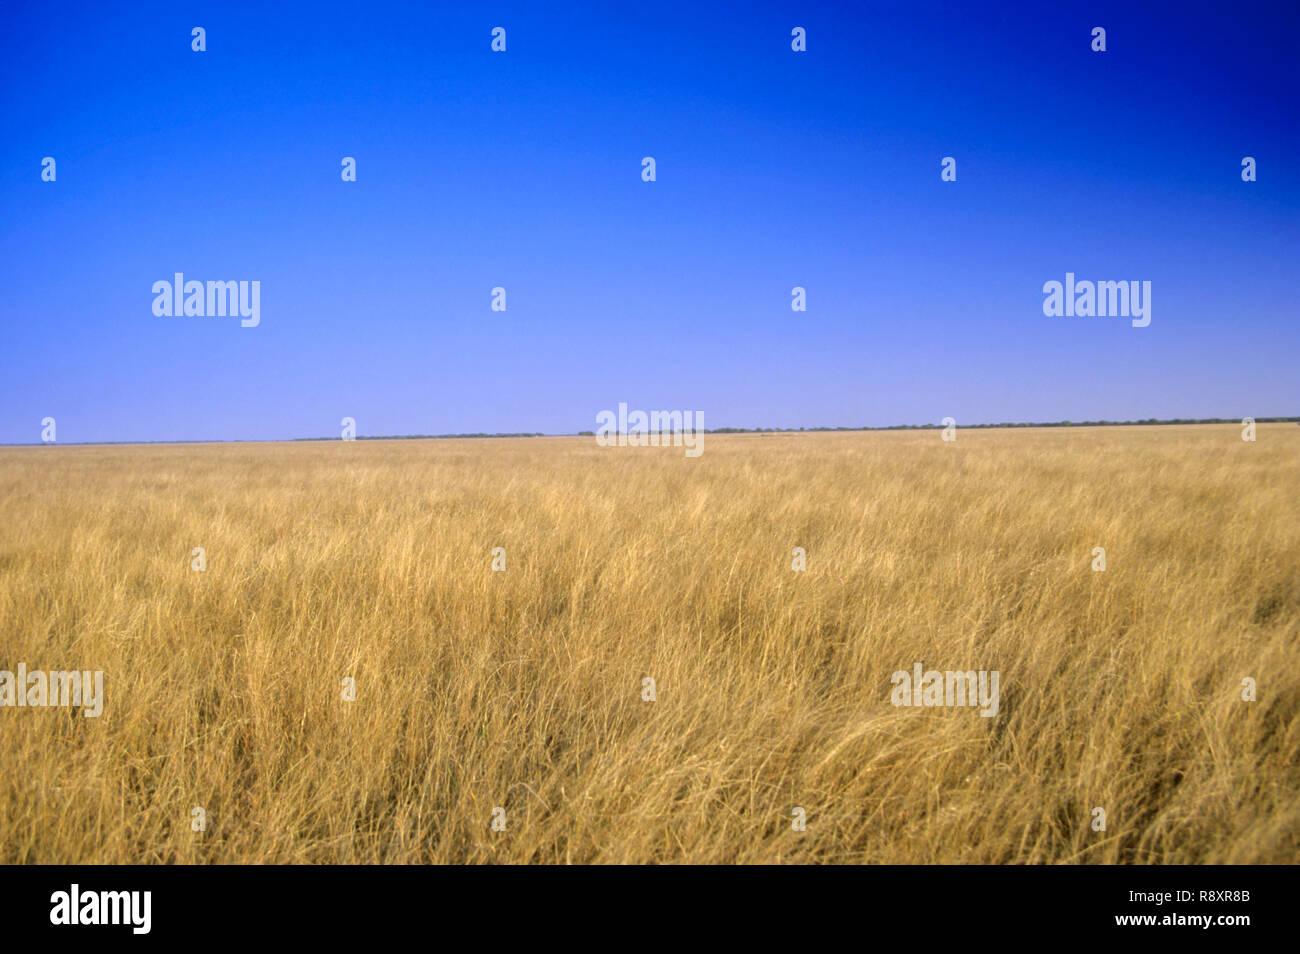 Wheat Fields - Stock Image